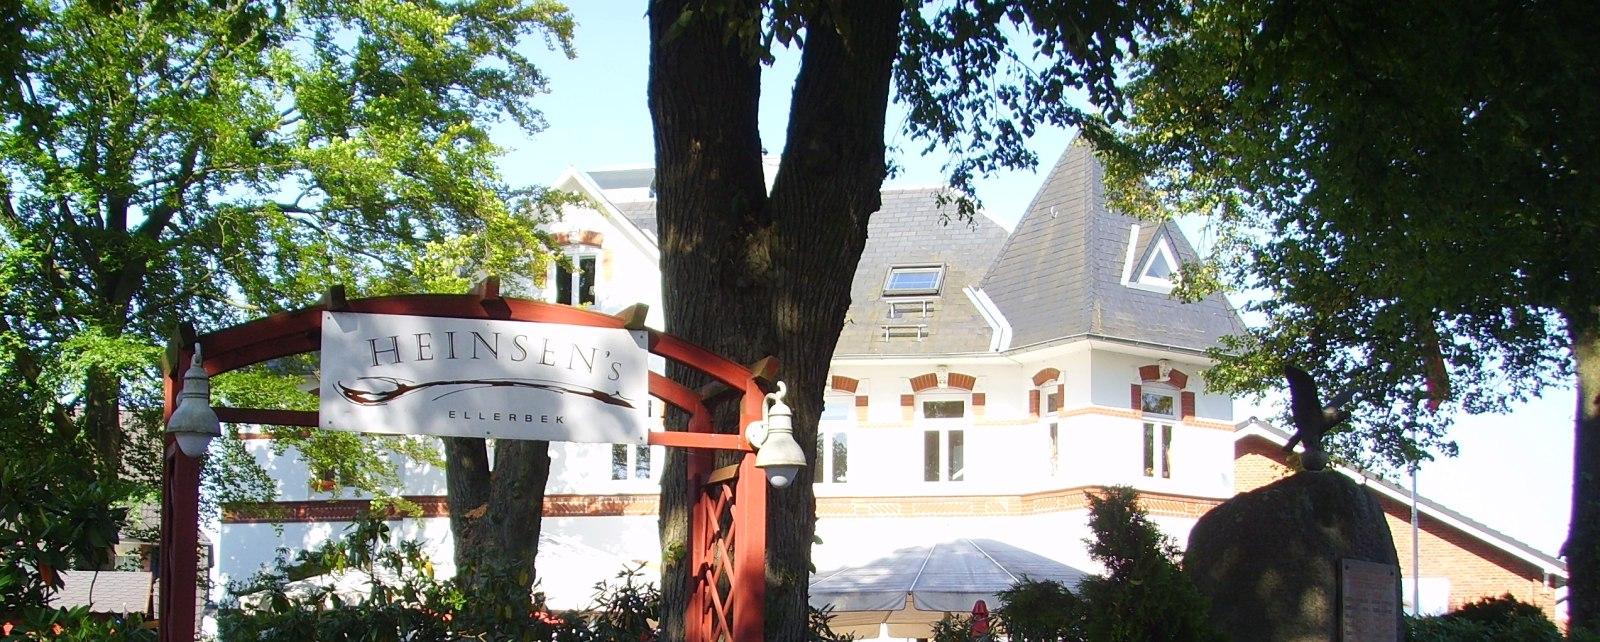 Ellerbek – Heinsen's